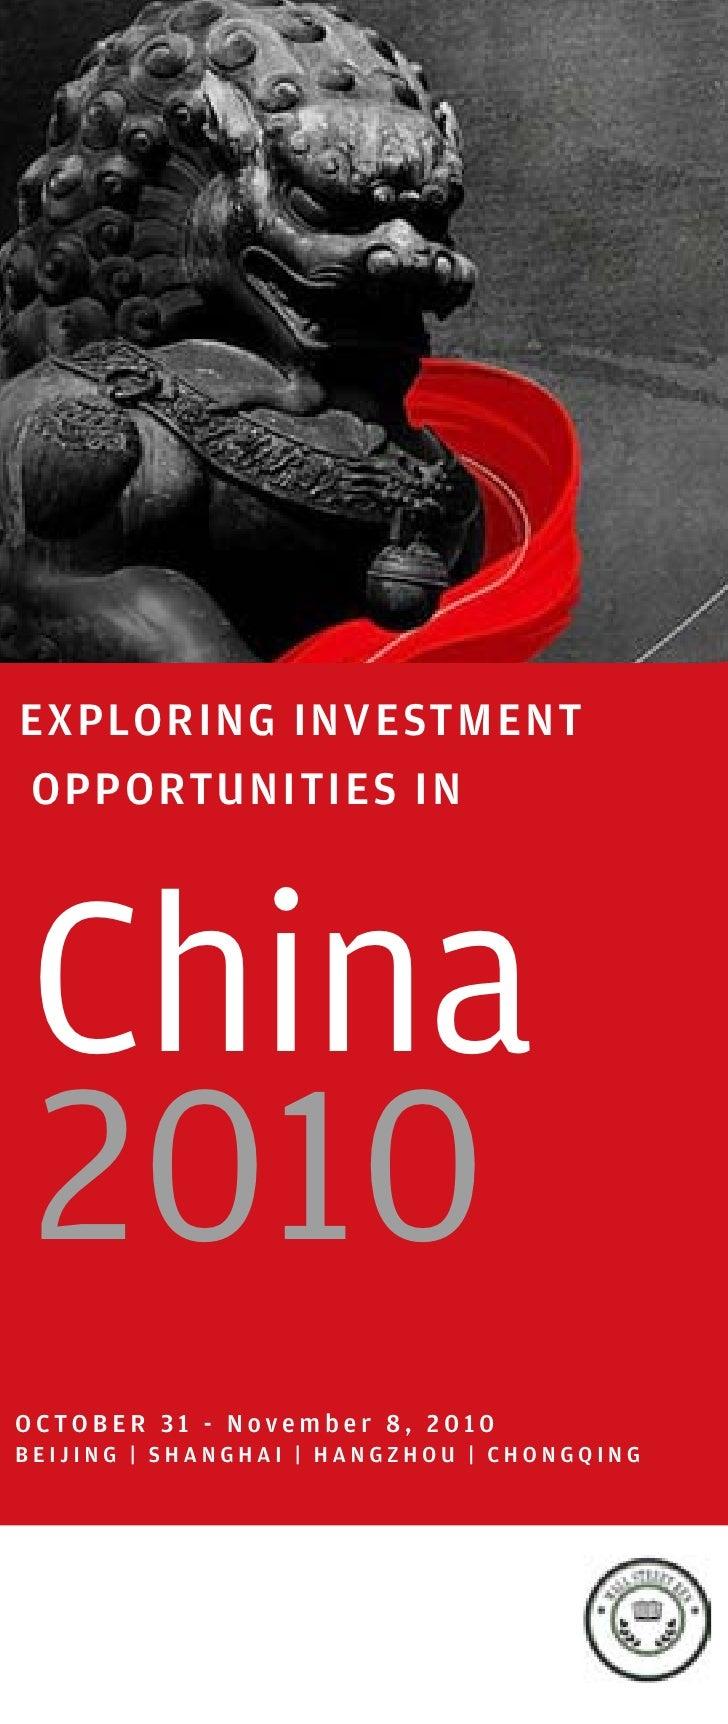 EXPLORING INVESTMENTOPPORTUNITIES INChina2010OCTOBER 31 - November 8, 2010BEIJING | SHANGHAI | HANGZHOU | CHONGQING